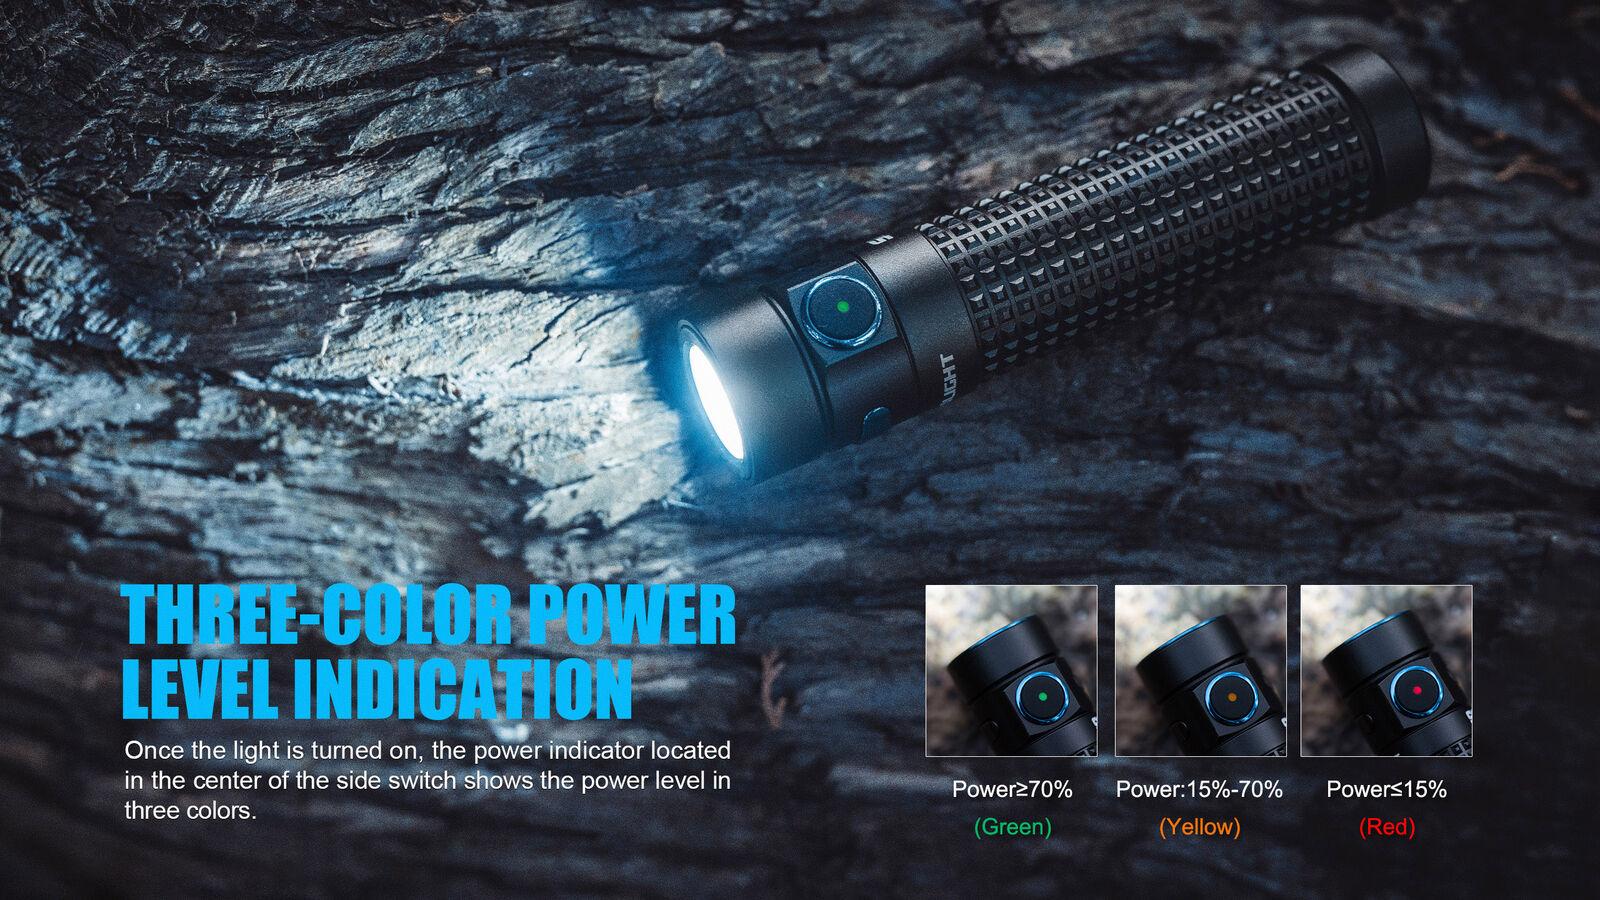 Olight S2R Baton II II Baton 1150 lm Rechargeable Flashlight w/ 2x Olight Batteries 97740c